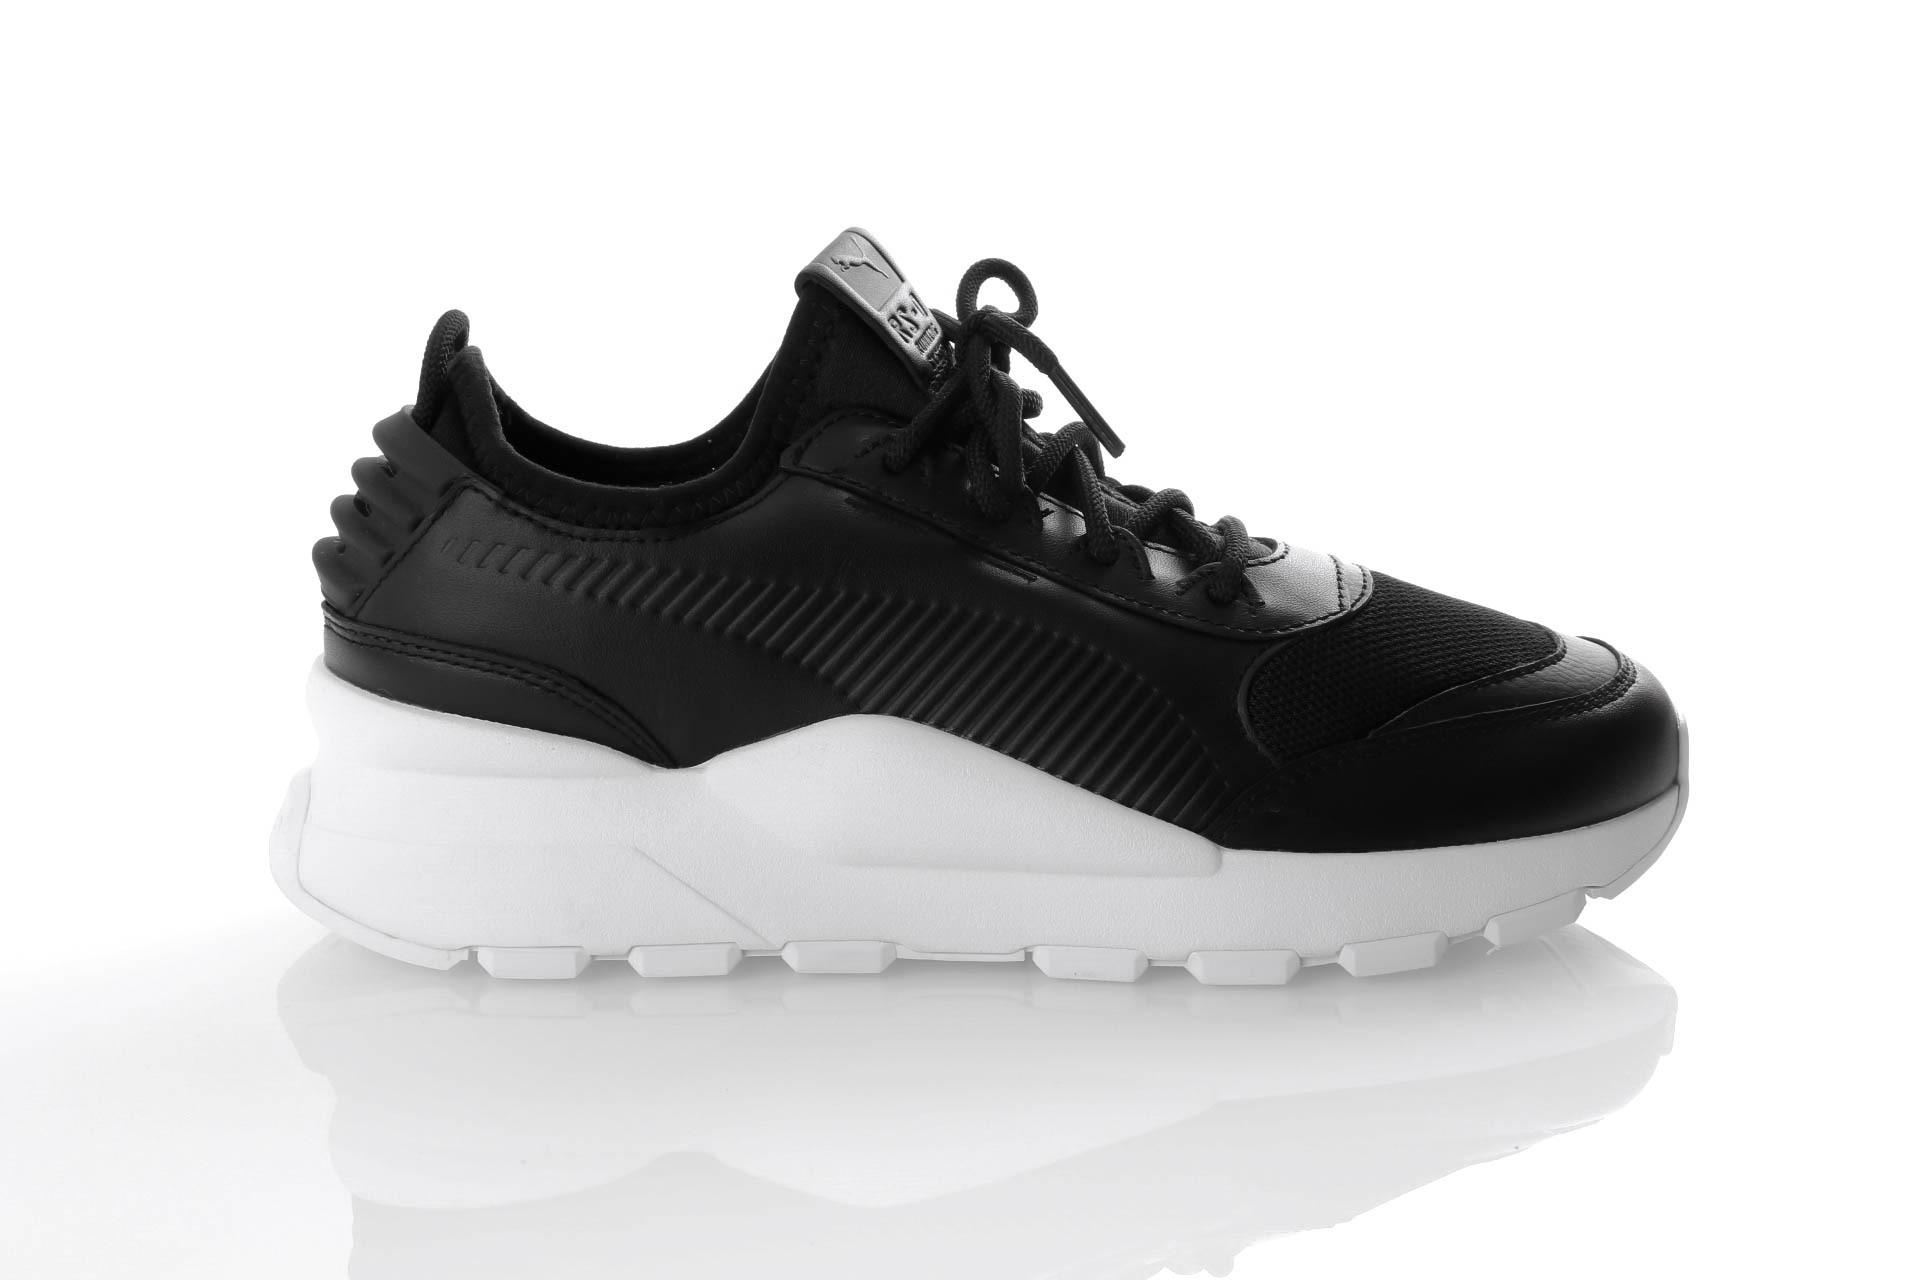 Foto van Puma RS-0 808 366890 Sneakers puma black